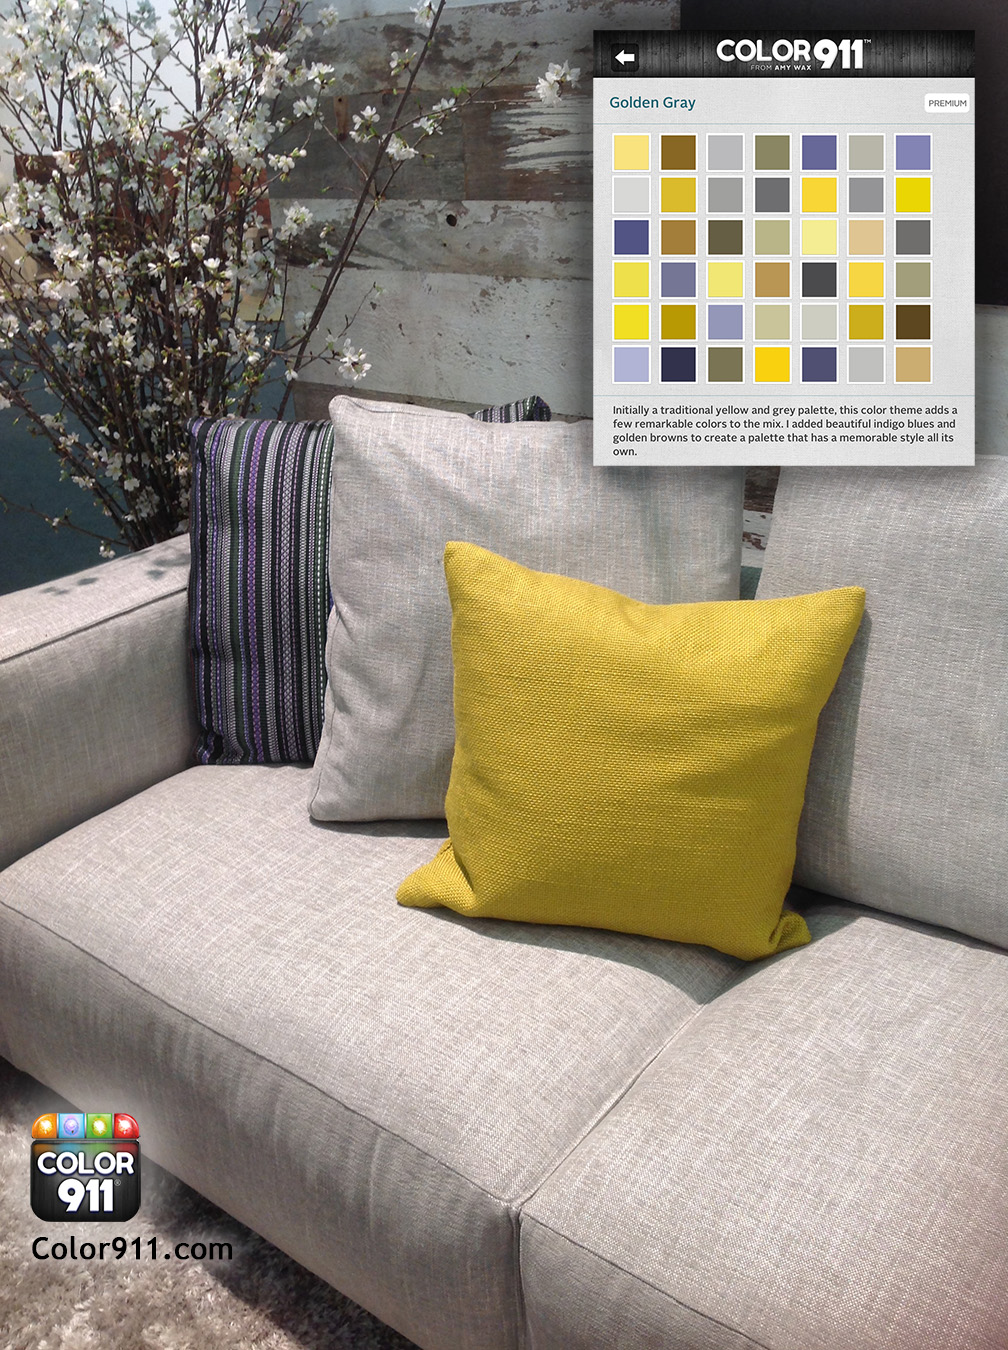 Color911 - ADHDs2014 - Gray sofa - Golden Gray